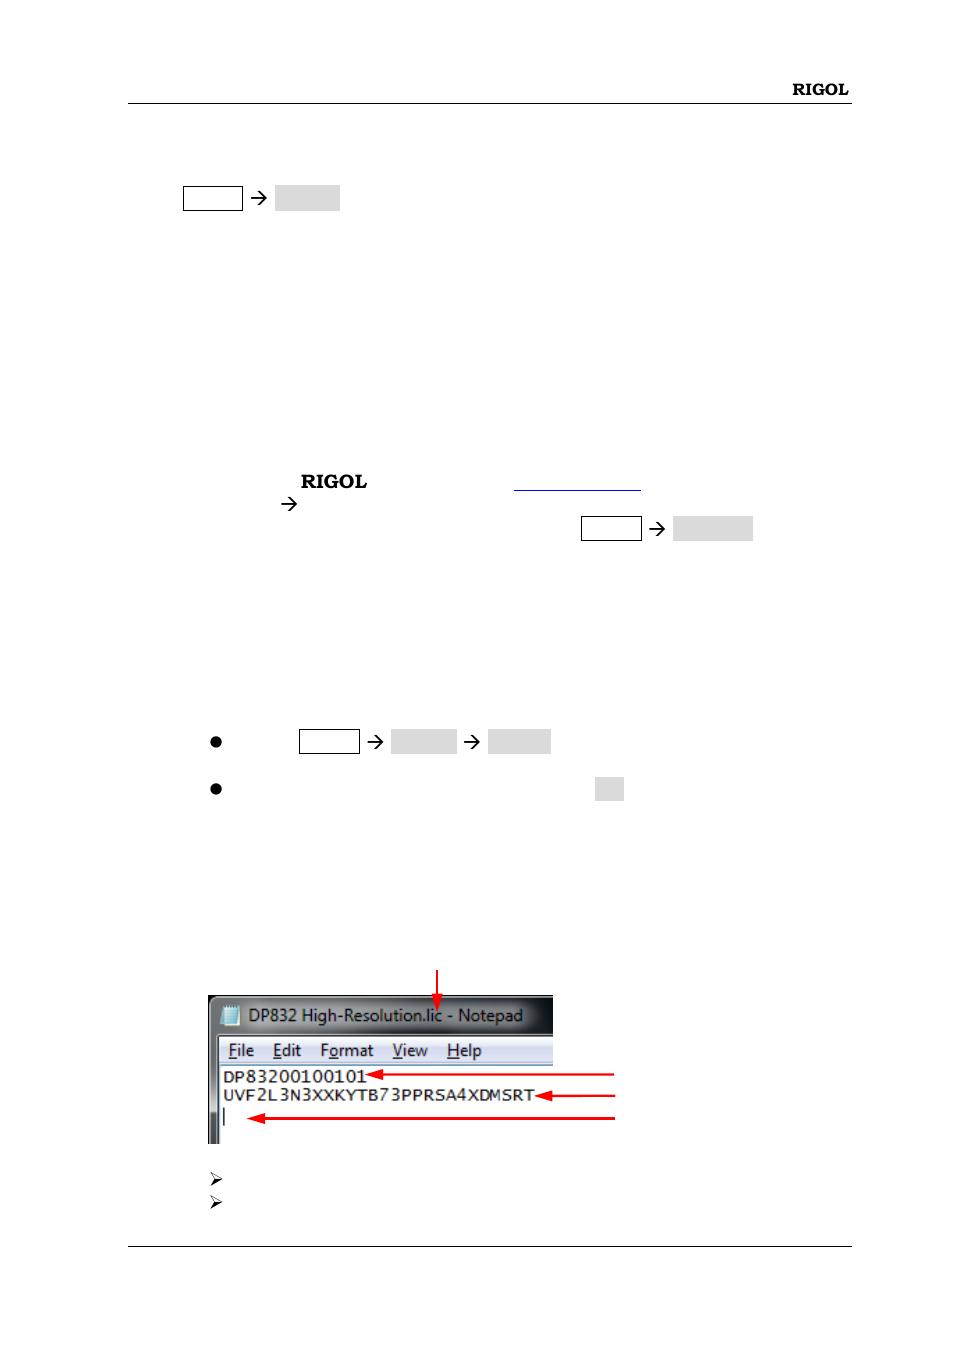 Options, Options -69 | RIGOL DP832 User Manual | Page 119 / 144